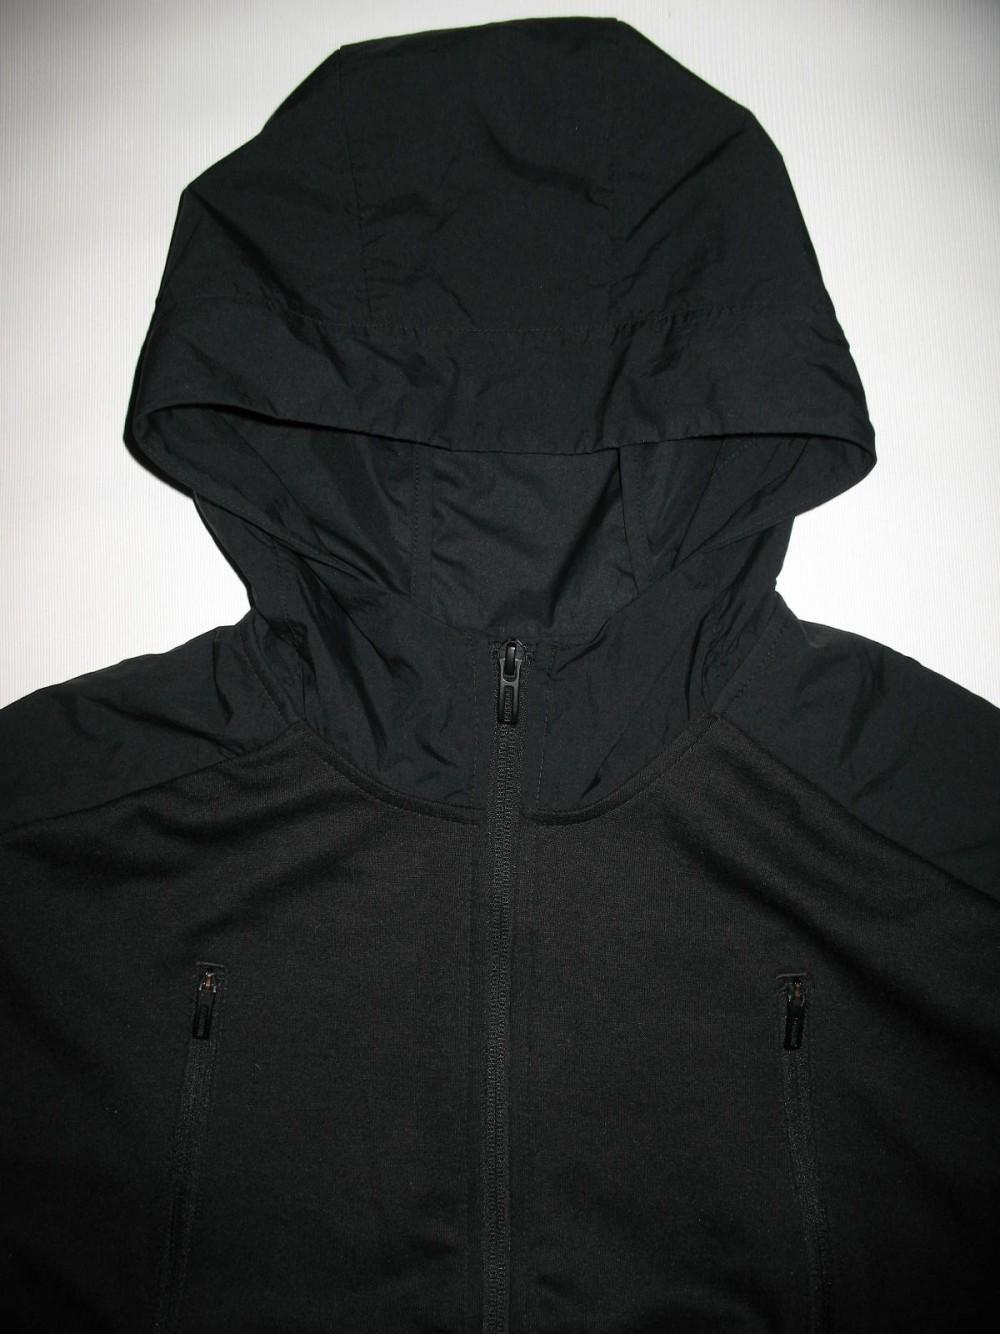 Куртка ADIDAS id hybrid jacket (размер M) - 4